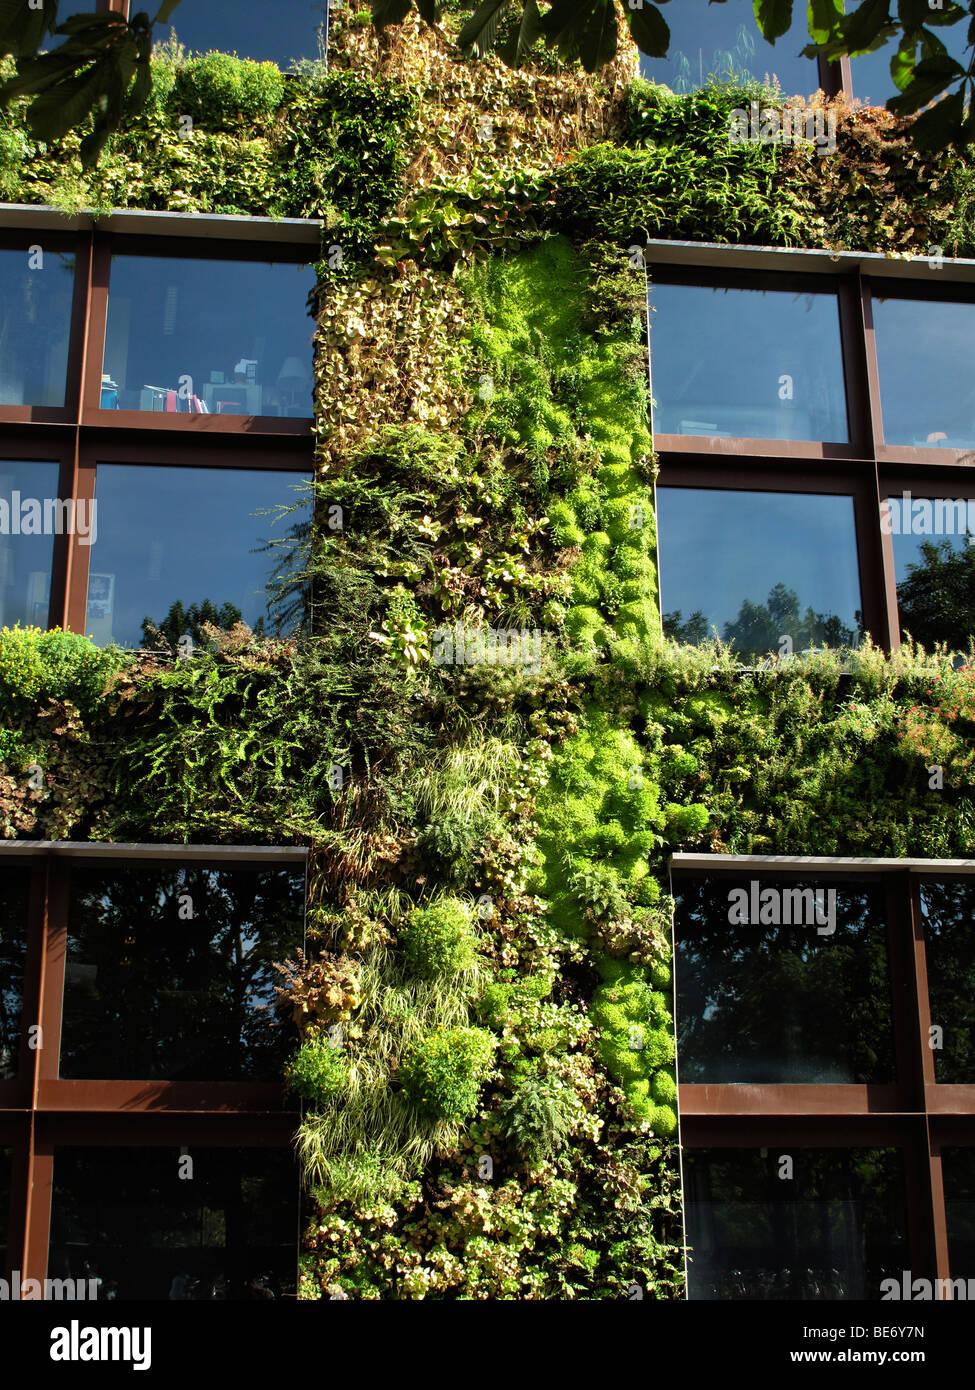 Vertical Garden Stockfotos & Vertical Garden Bilder - Alamy